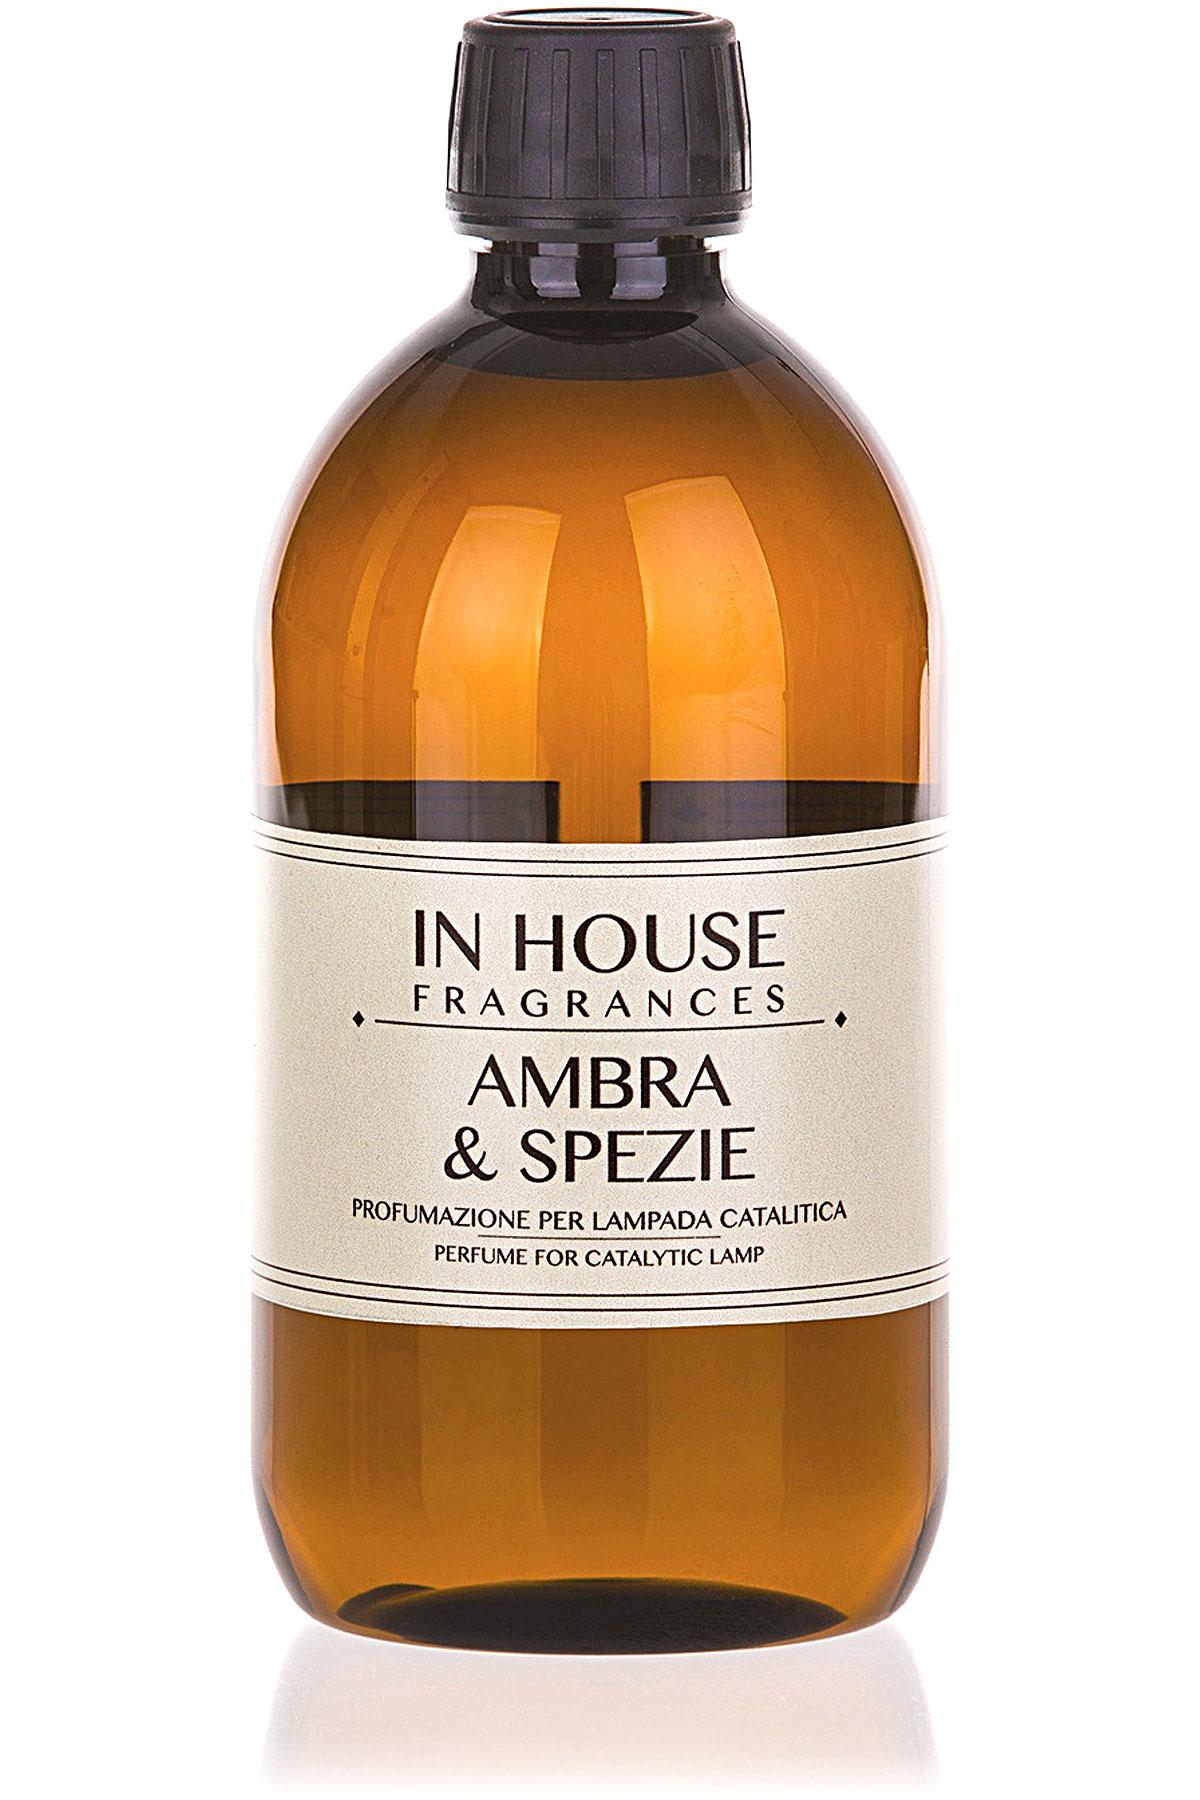 In House Fragrances Home Scents for Men, Arancio & Cannella - Catalyst Perfume Lamp Refill - 500 Ml, 2019, 500 ml